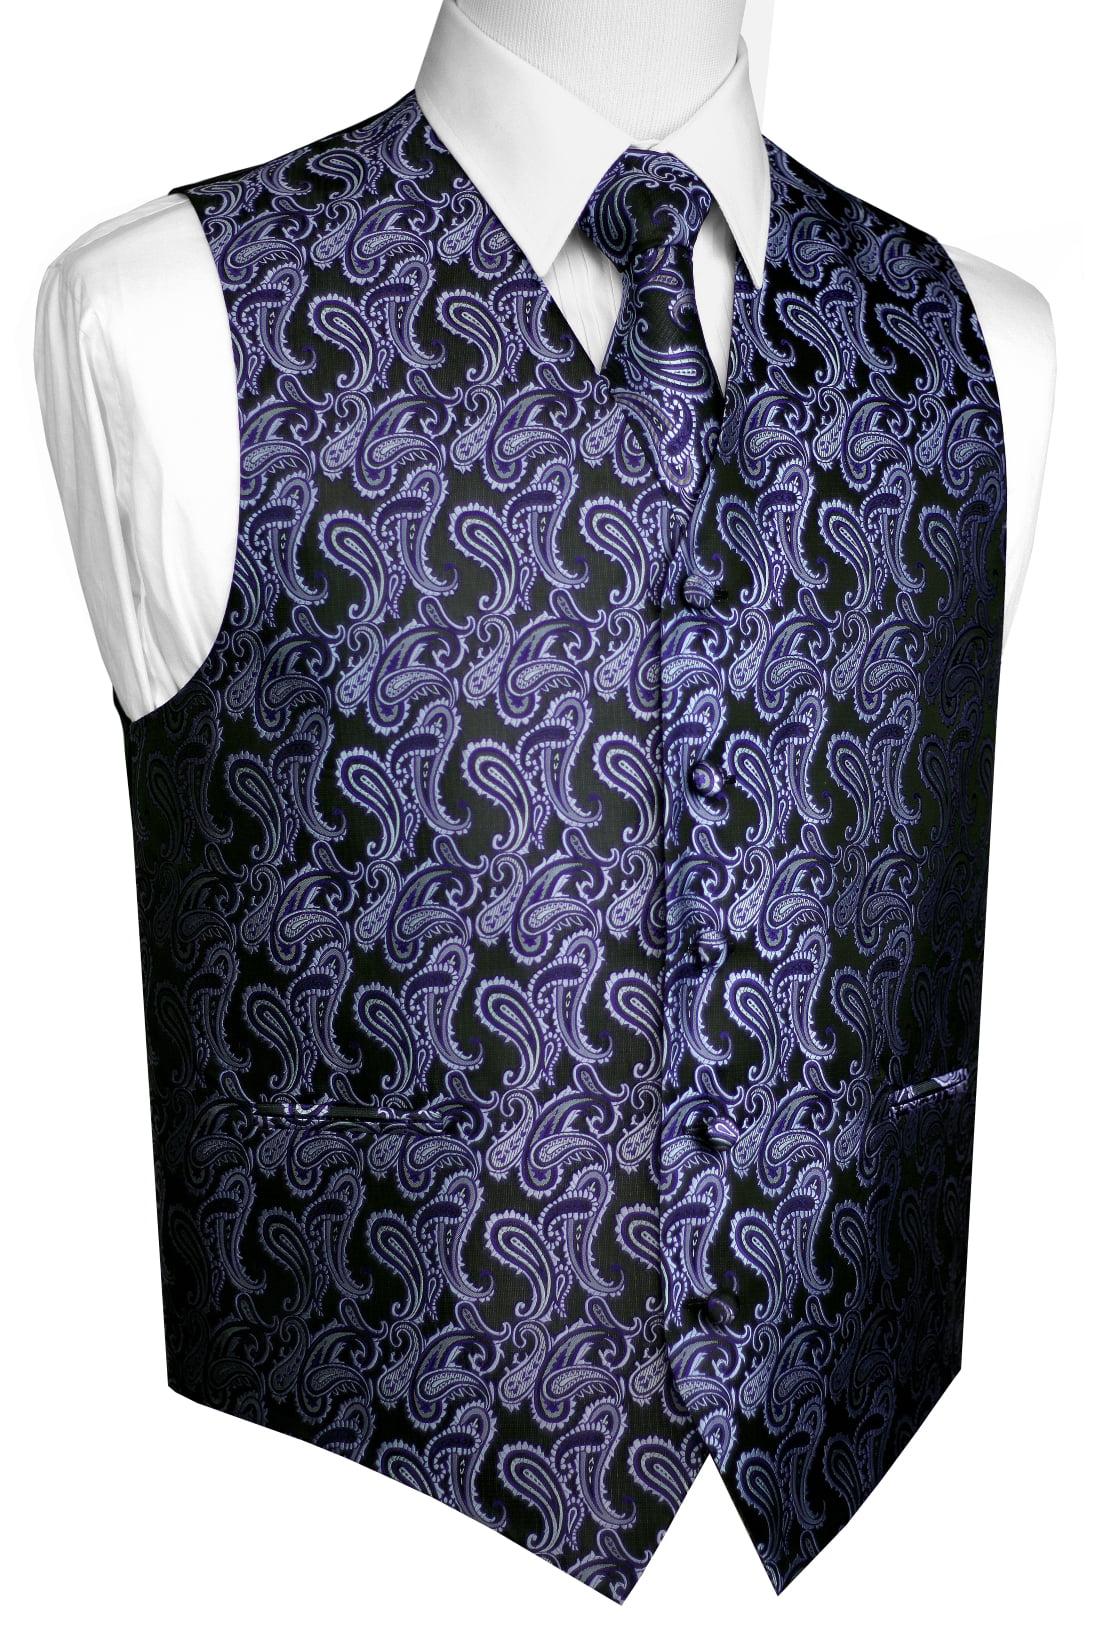 Italian Design, Men's Tuxedo Vest, Tie & Hankie Set - Purple Paisley